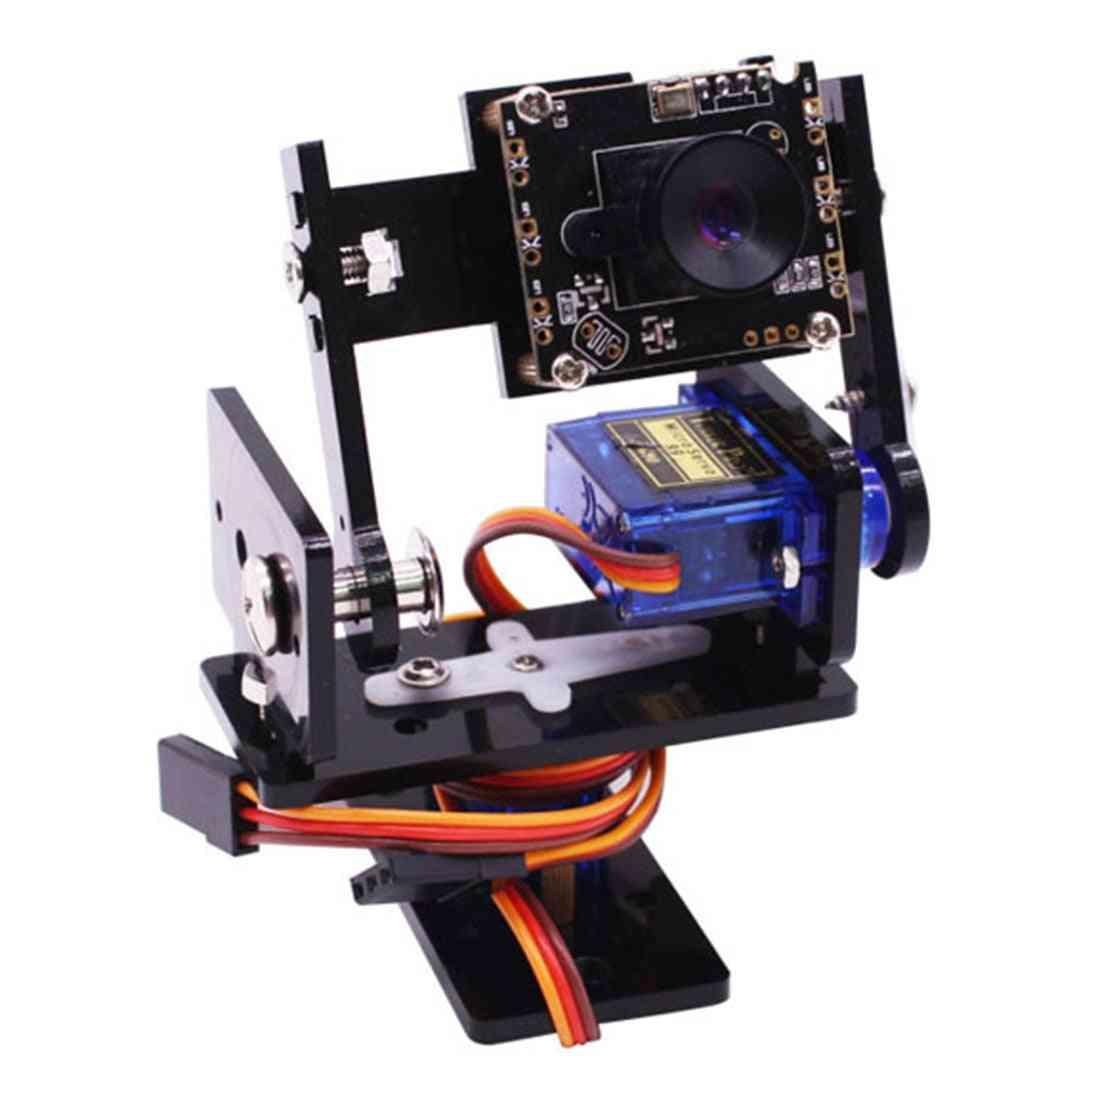 Sensor Kit With Micro Servos Smart Robot Hd Camera